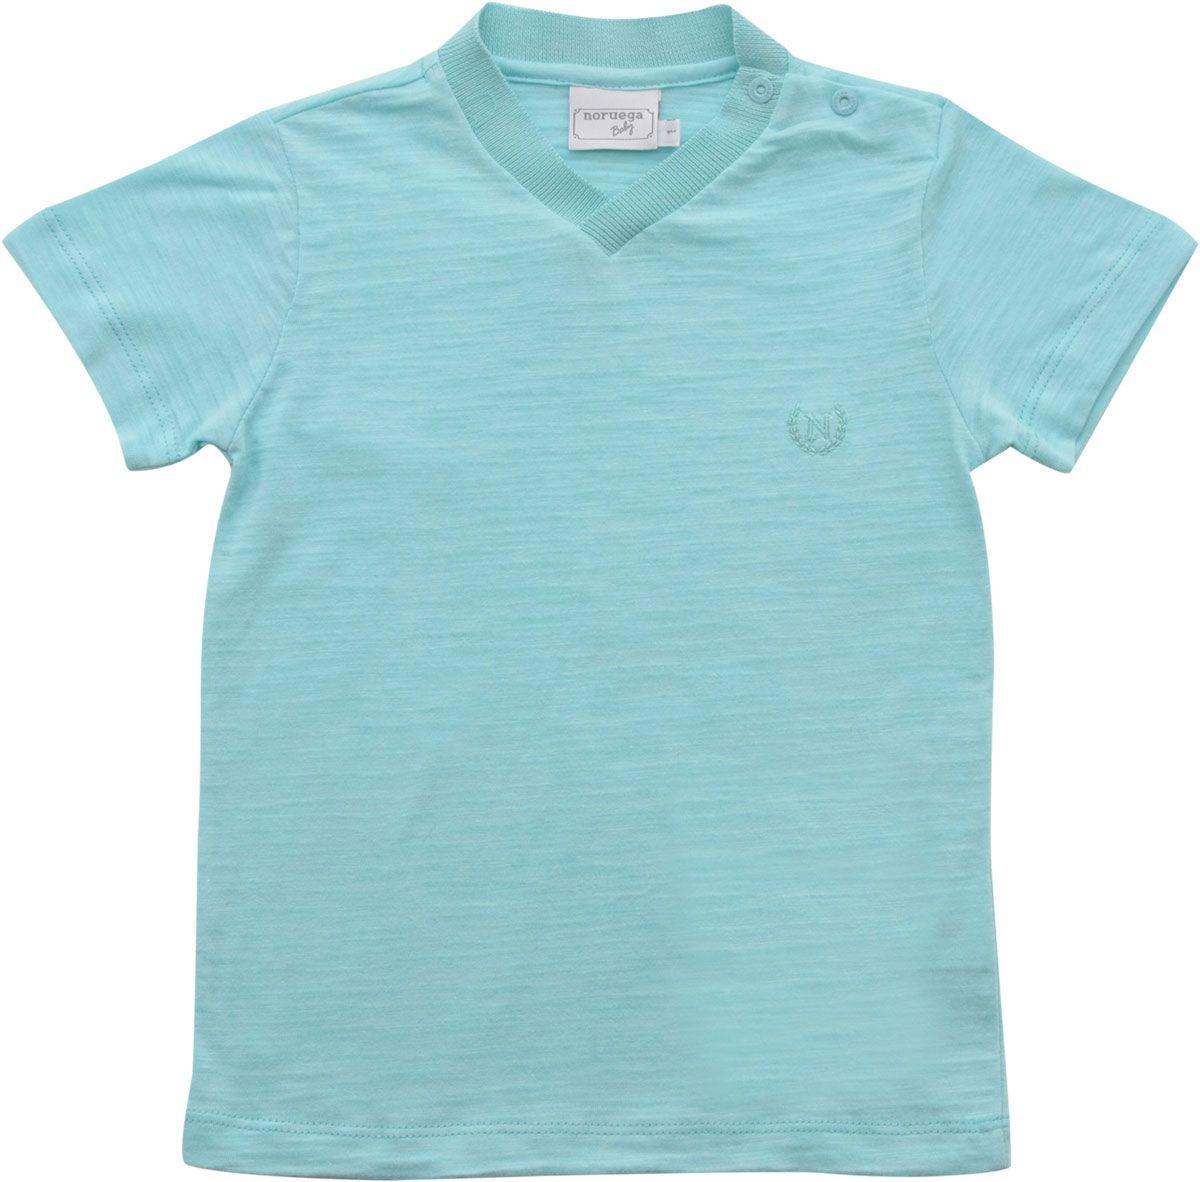 81.200 - Camisa Polo Gola V Bordado